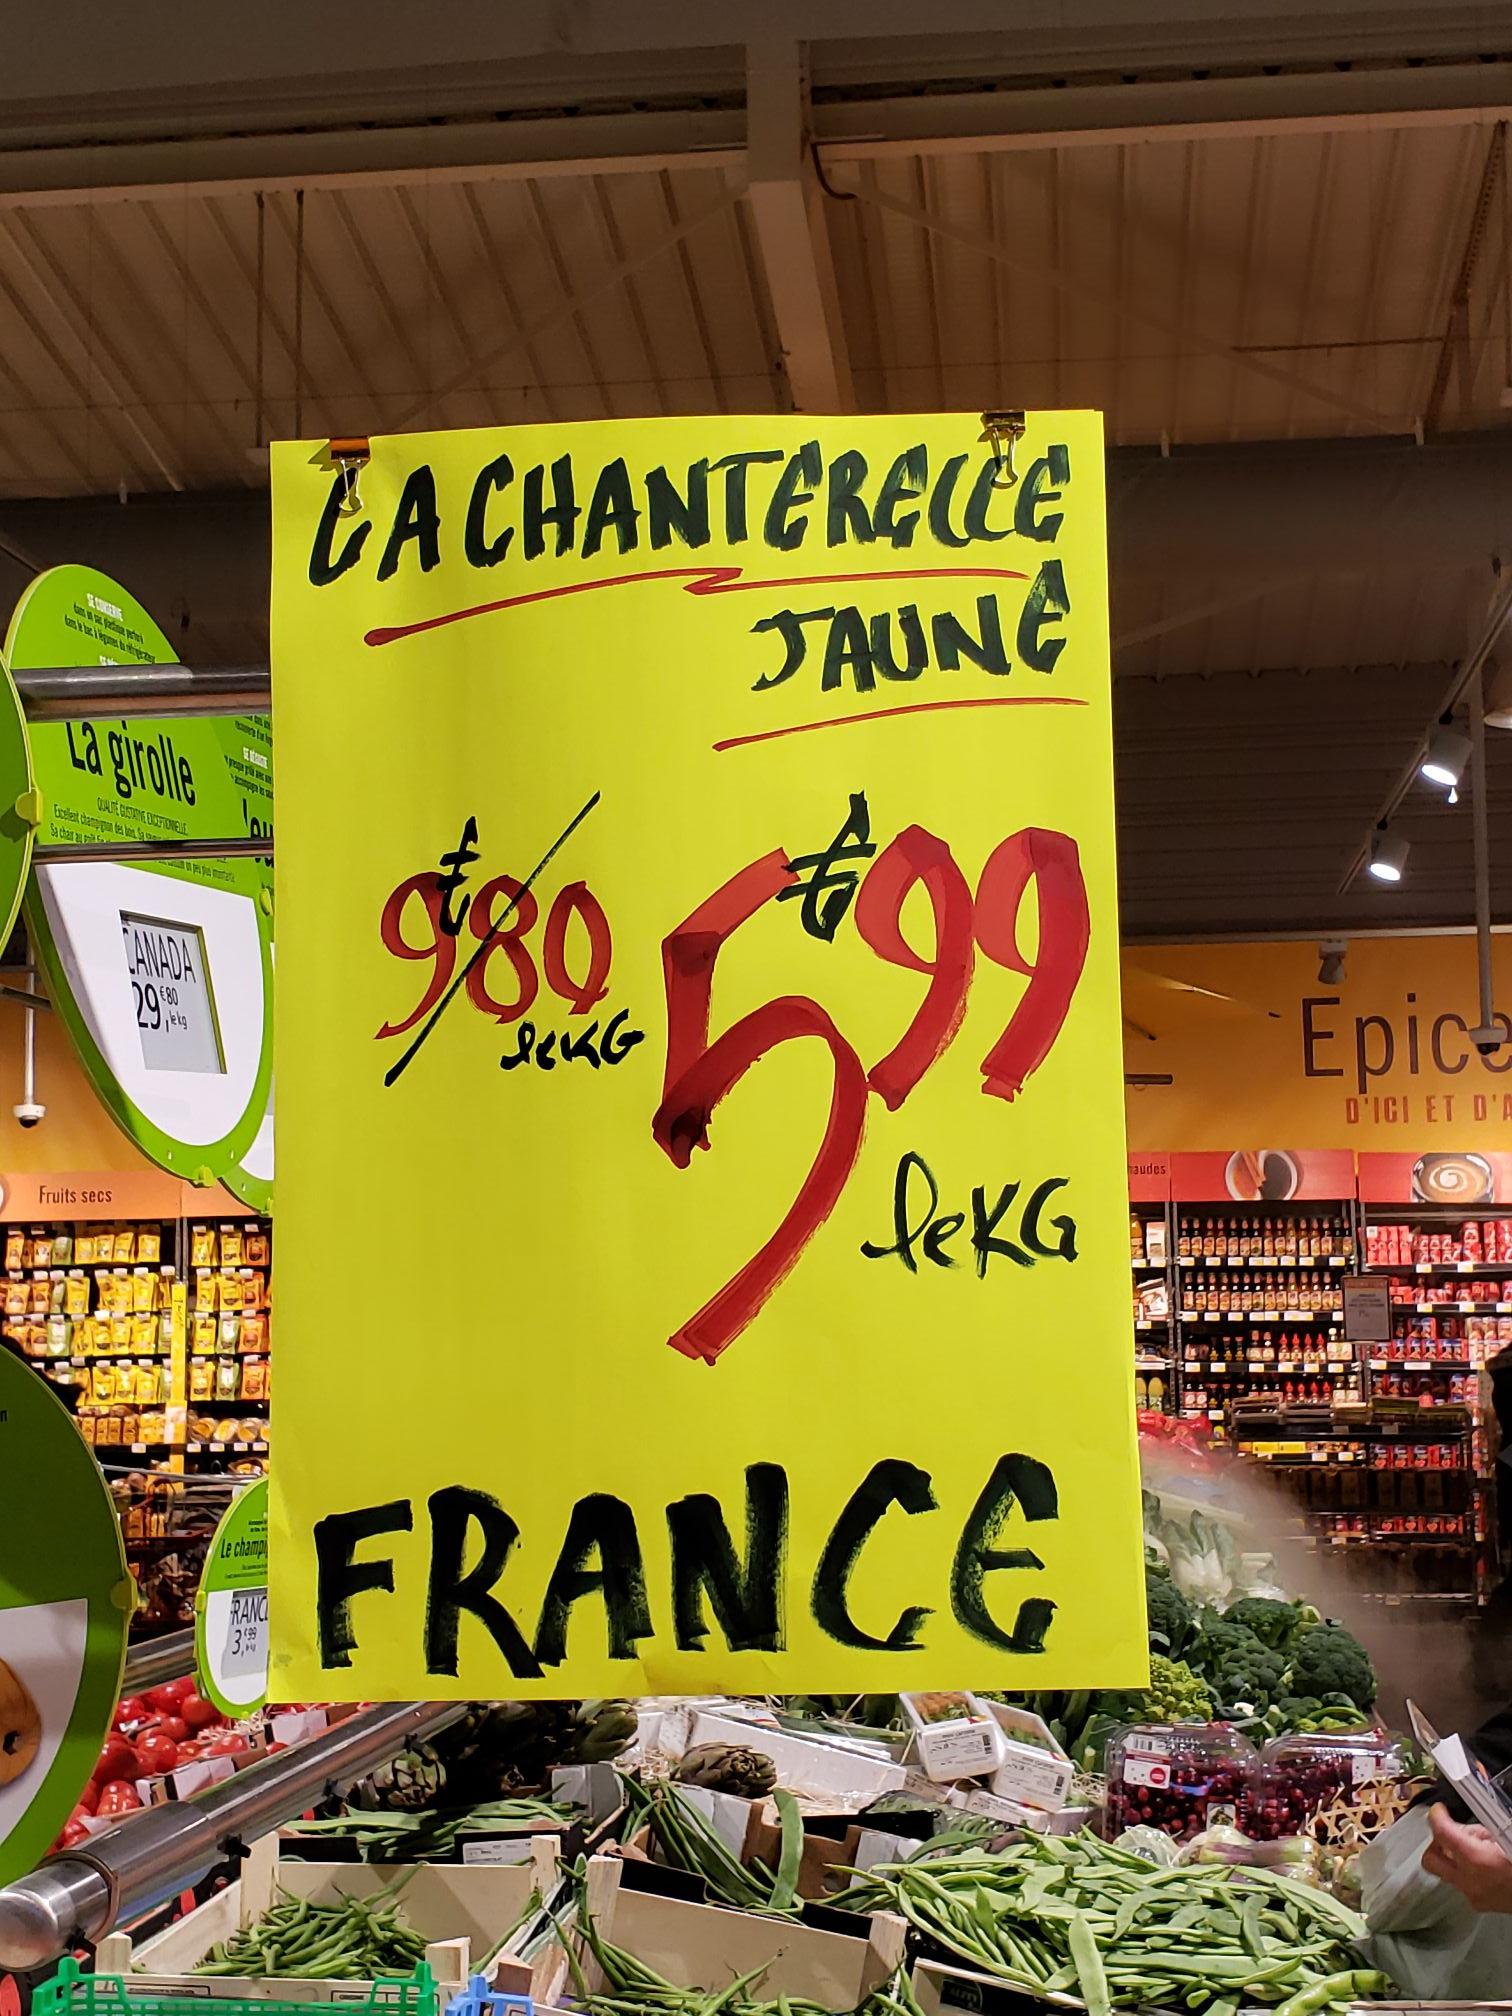 La chanterelle - 1Kg, Origine France (Strasbourg Haute pierre 67)